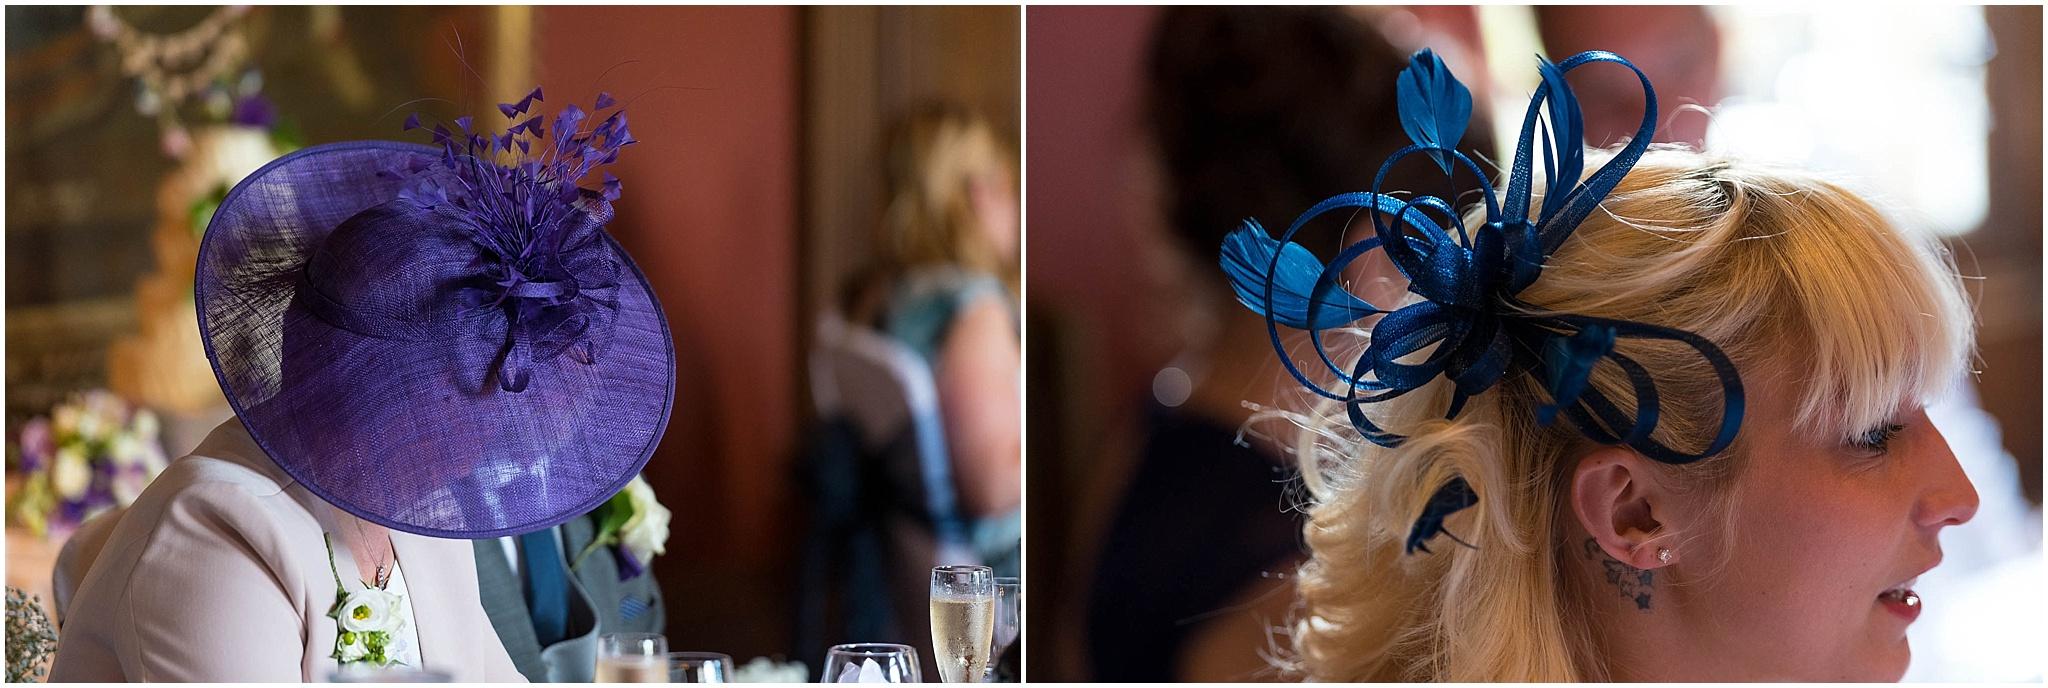 Crathorne Hall Hotel Wedding Photographer109.jpg